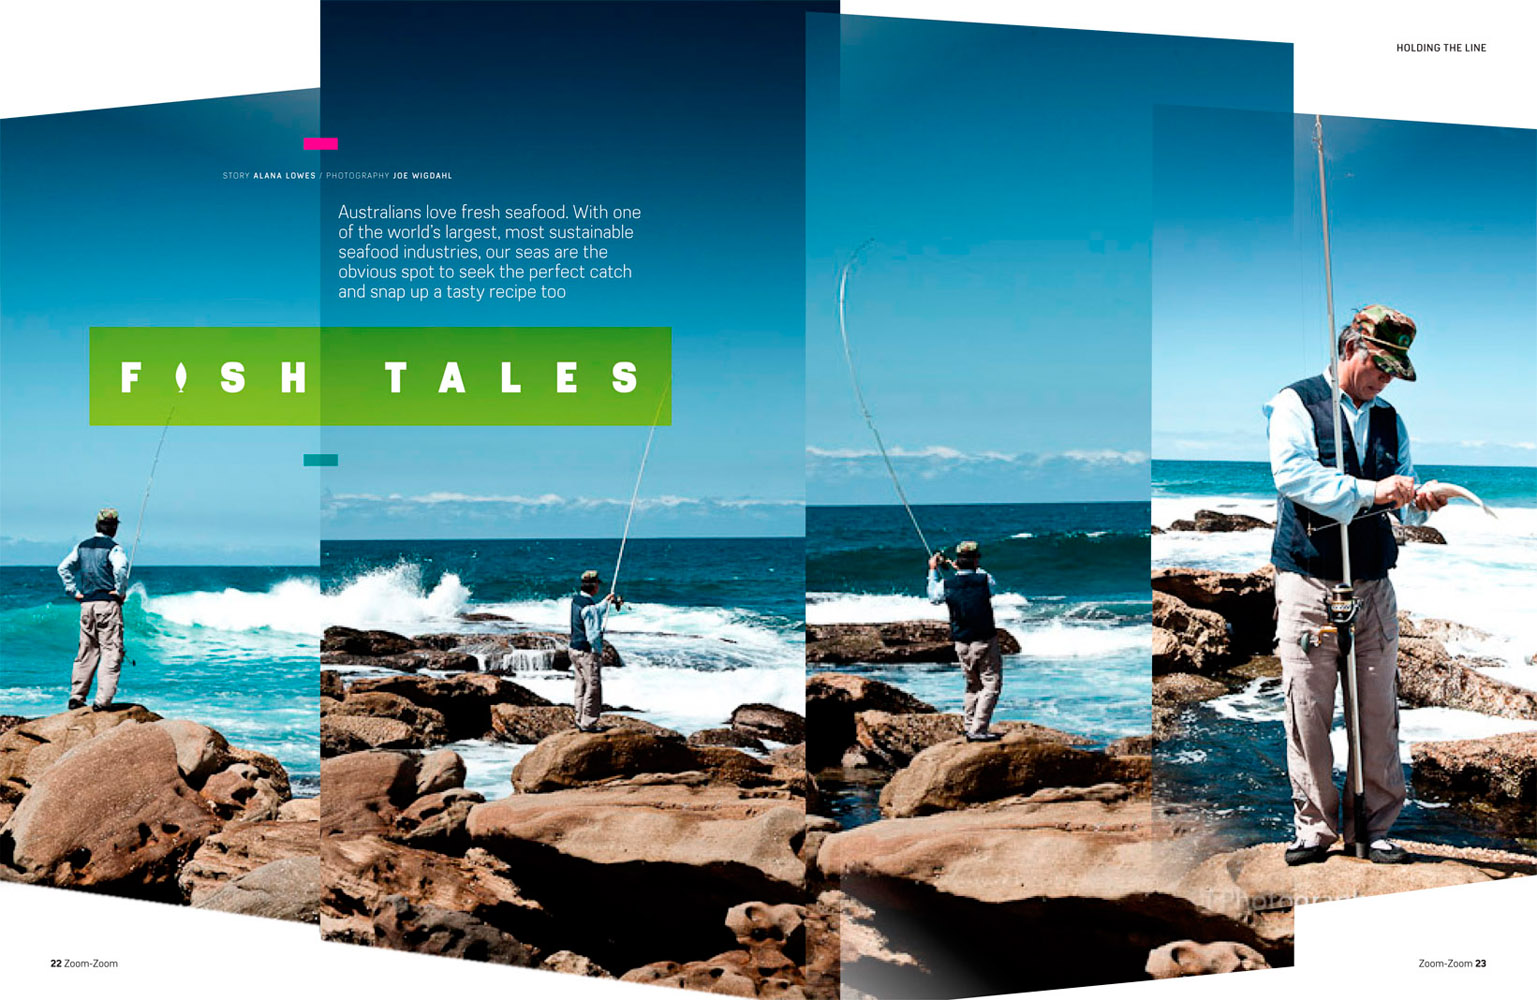 Fishtales-1_1600.jpg